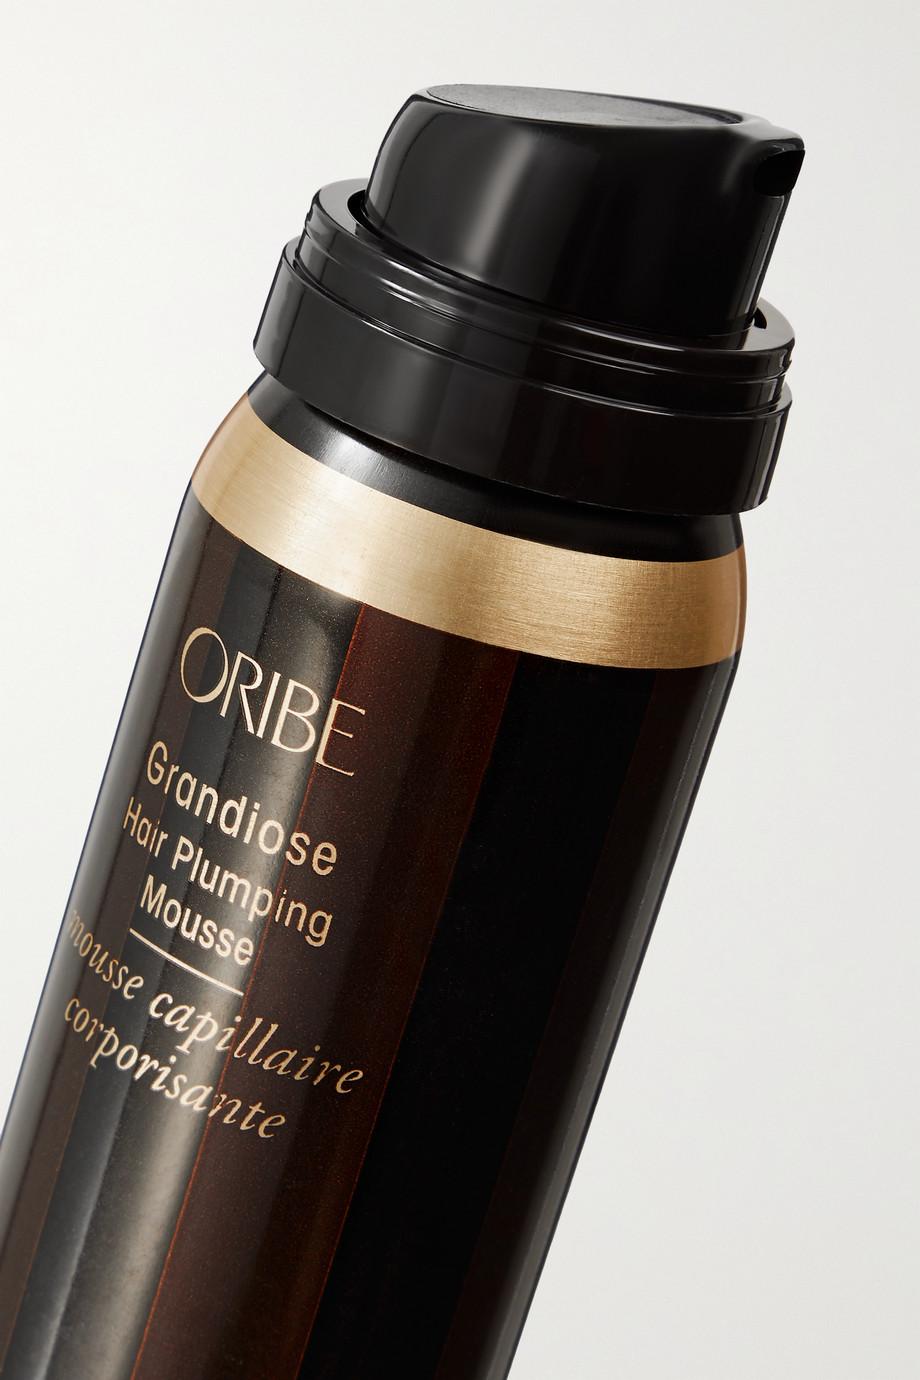 Oribe Grandiose Hair Plumping Mousse, 175ml